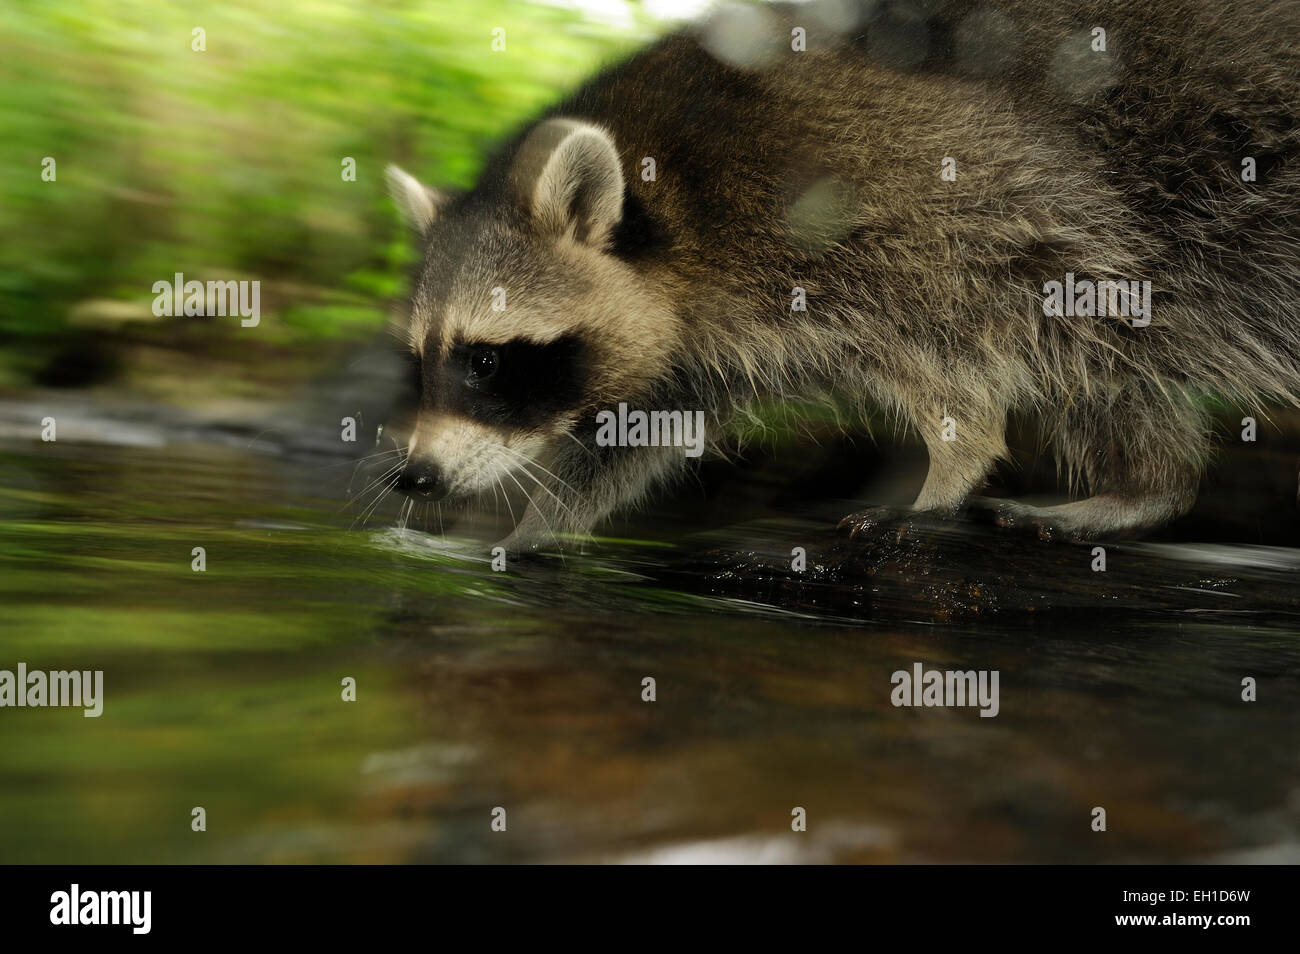 [Prisonnier] raton laveur (Procyon lotor)   Waschbär (Procyon lotor) Photo Stock